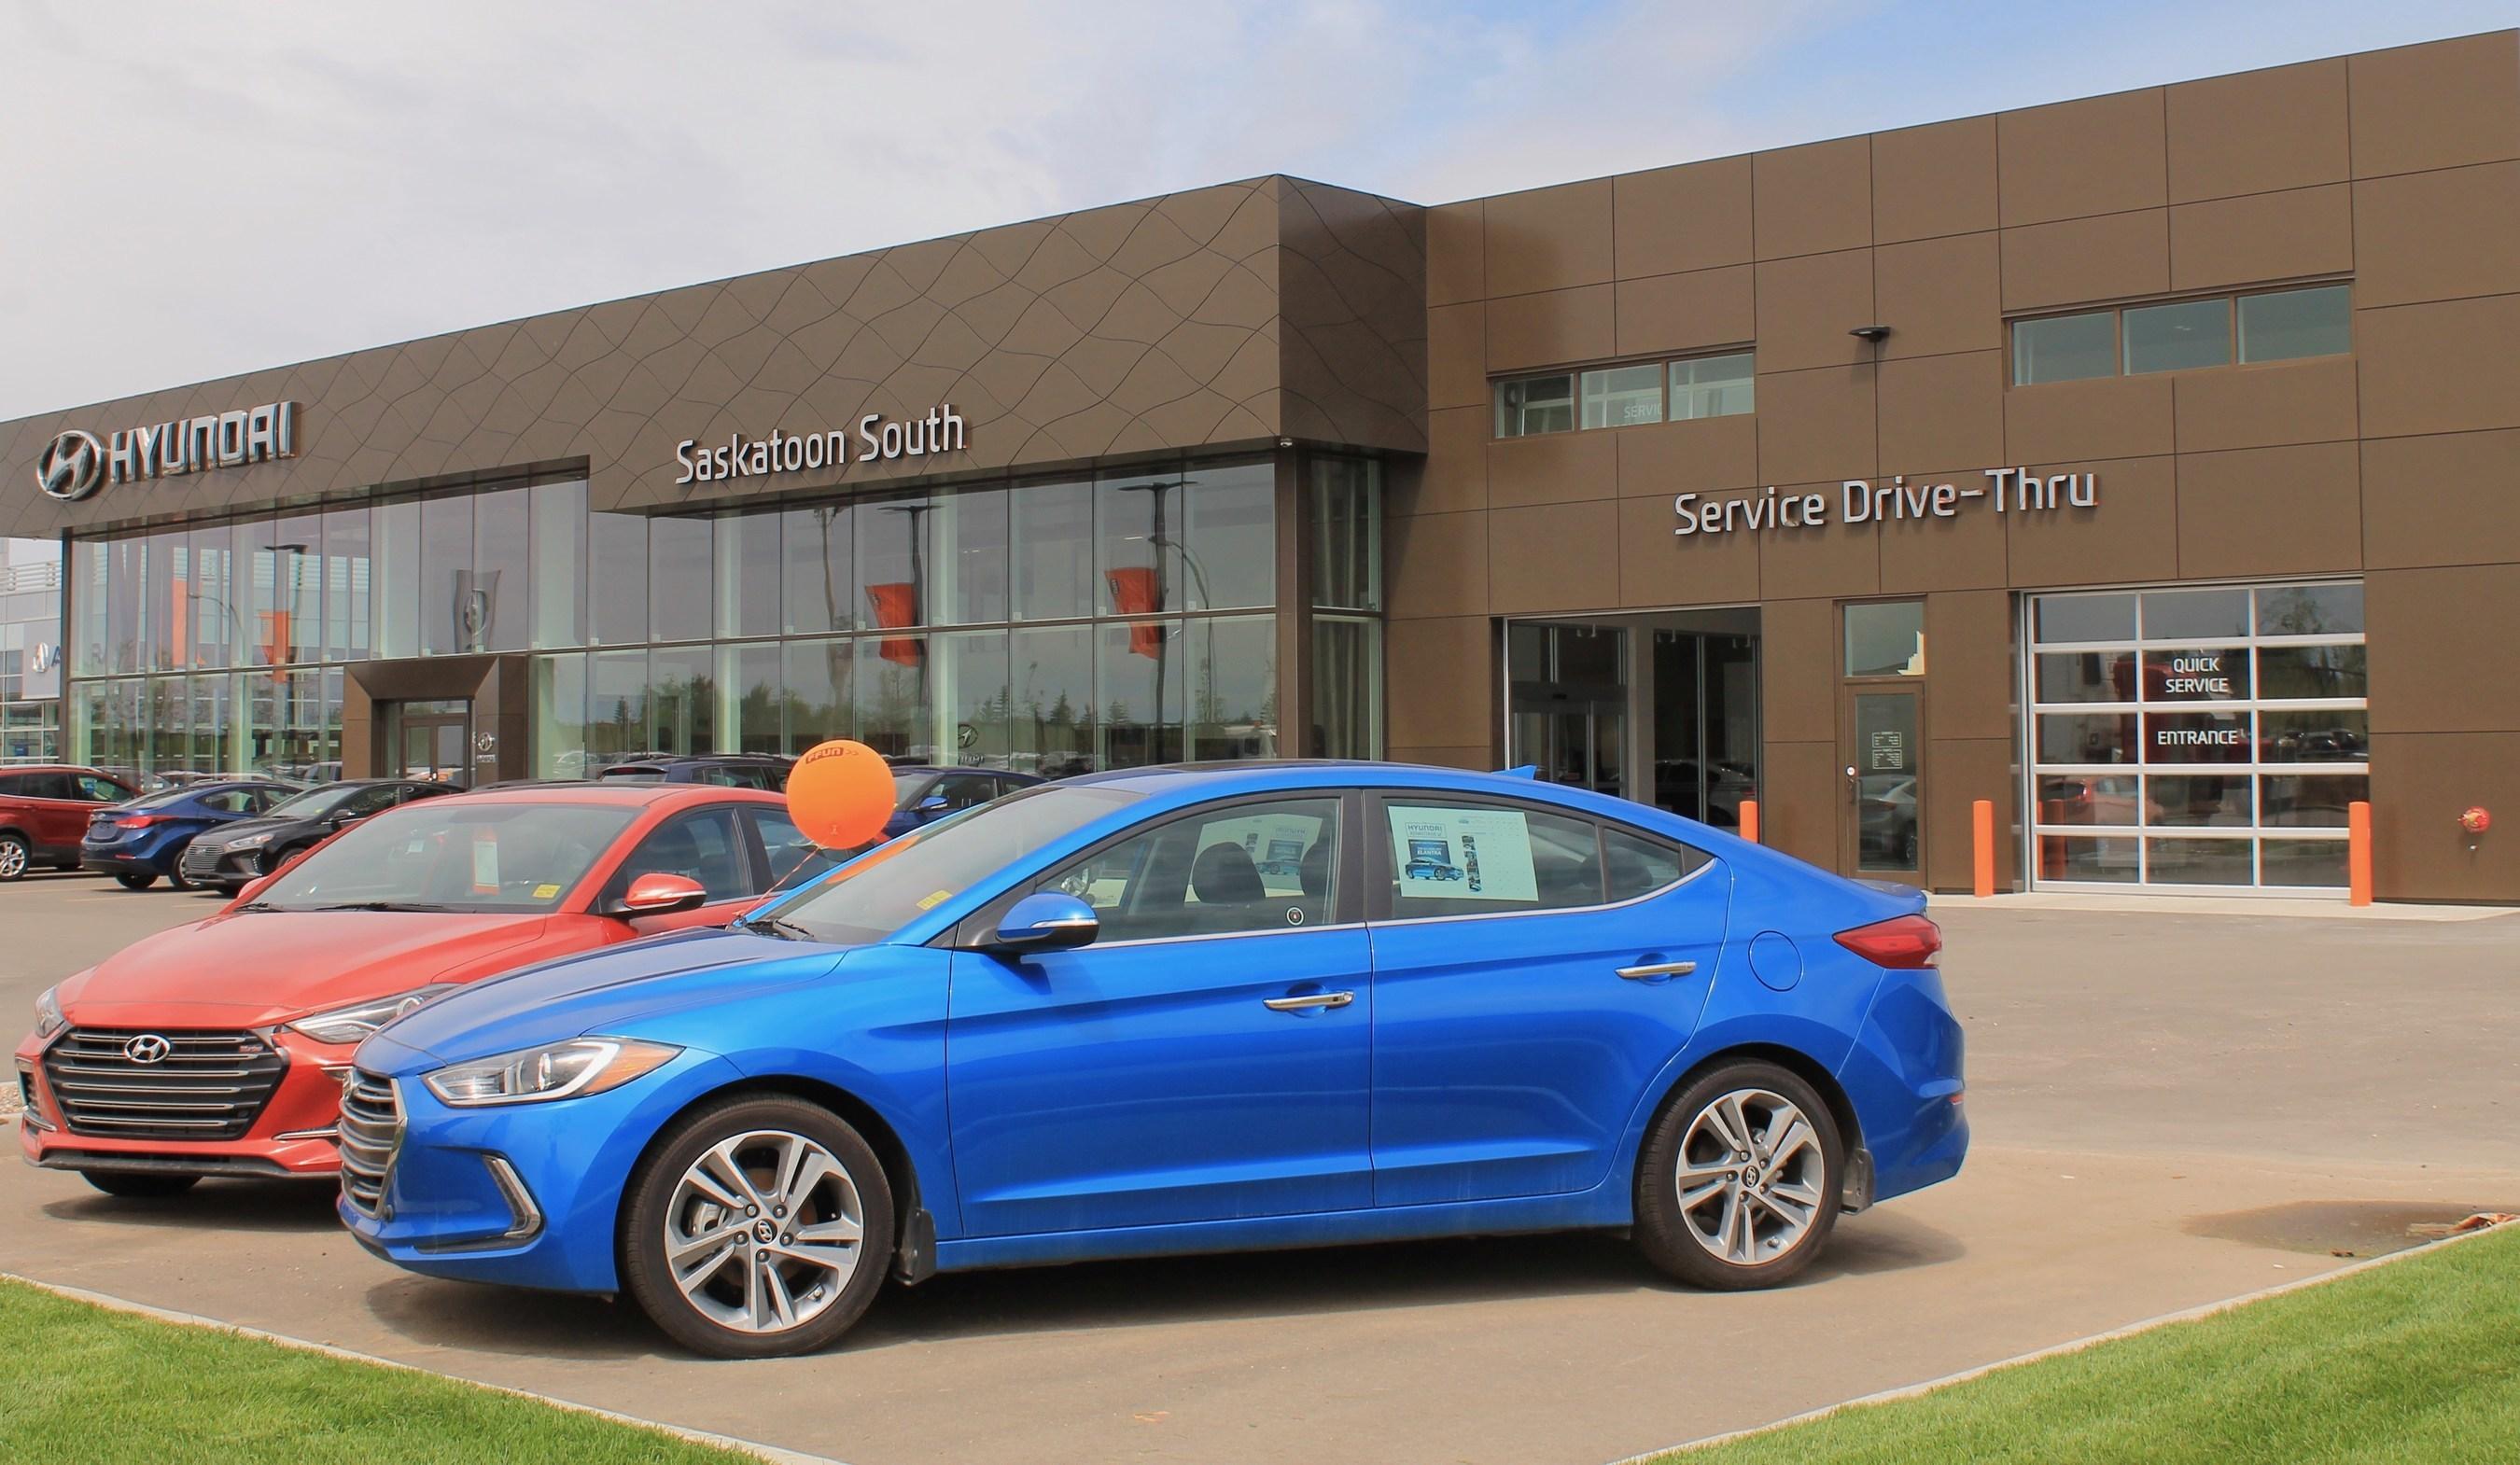 495d53a78810d Hyundai Auto Canada Corp  Brand new Saskatoon South Hyundai has.jpg p publish